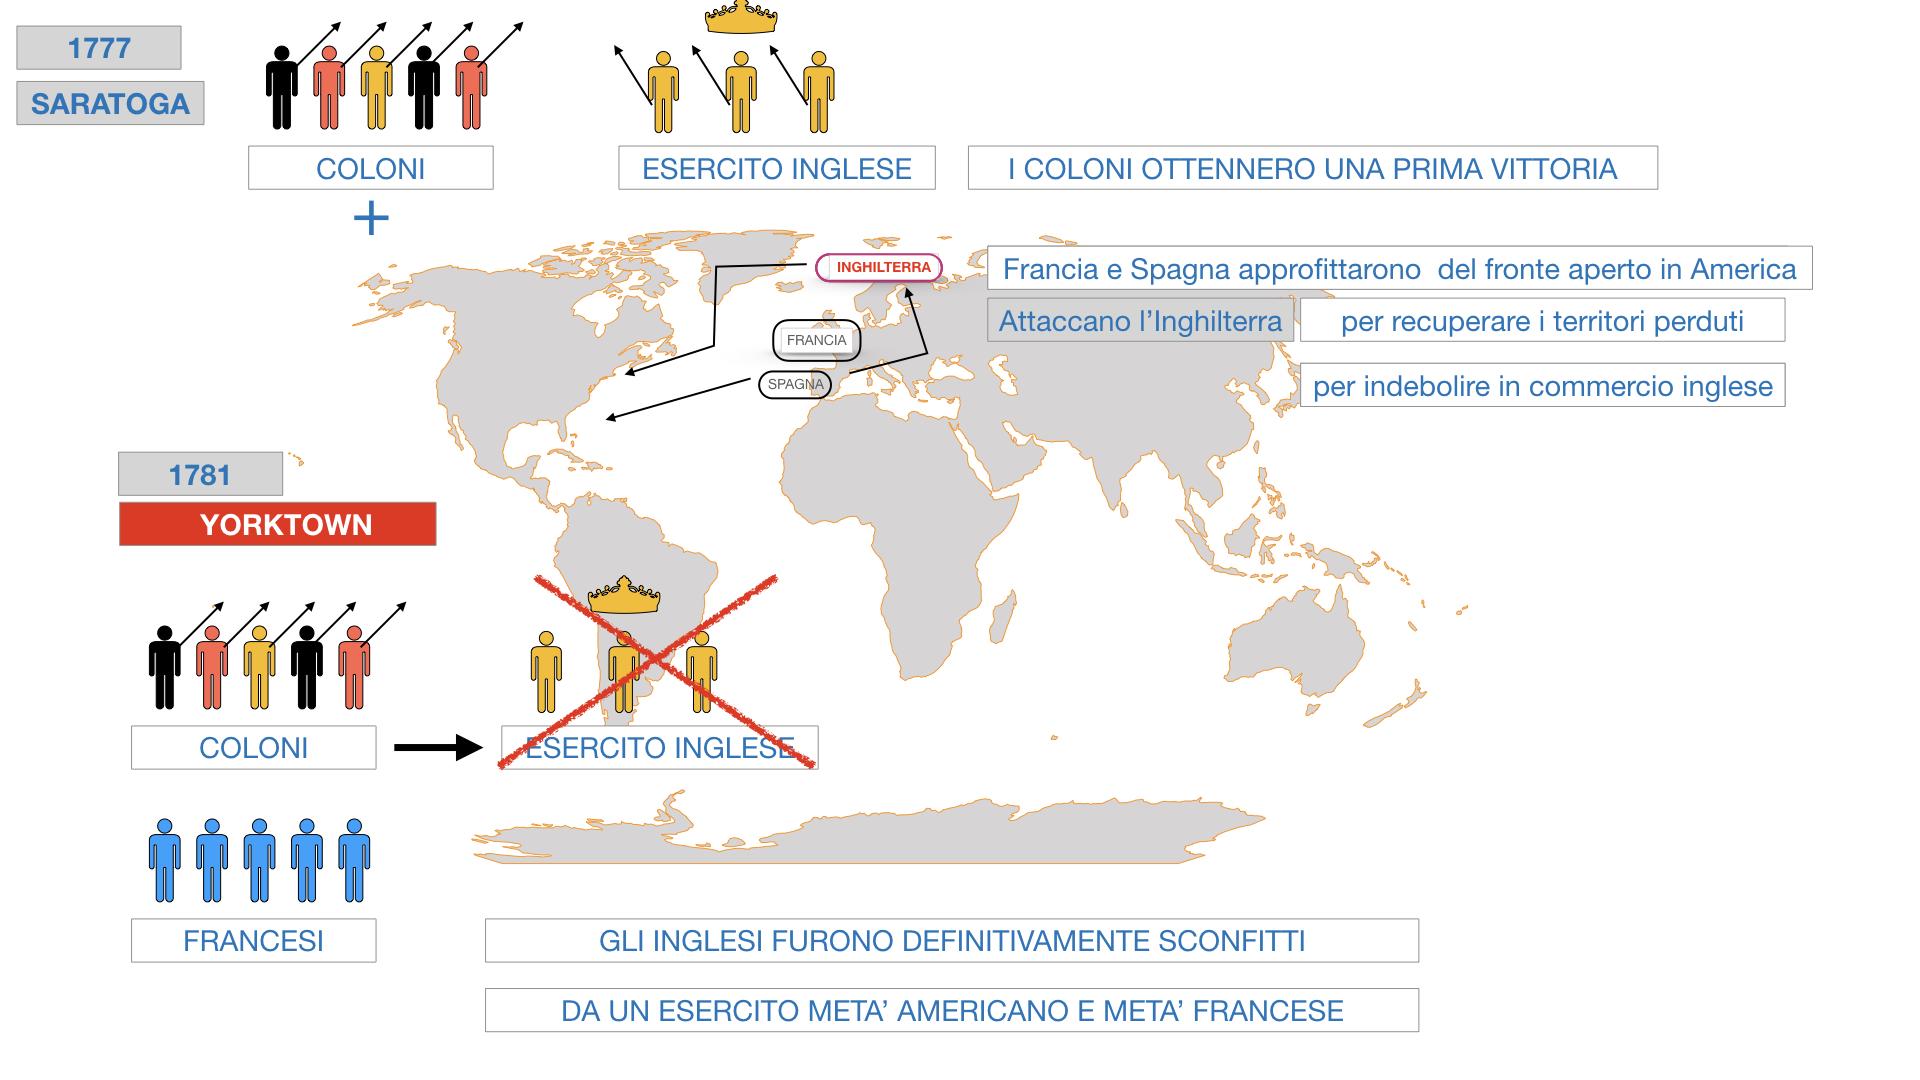 GUERRA DI INDIPENDENZA AMERICANA_SIMULAZIONE.133